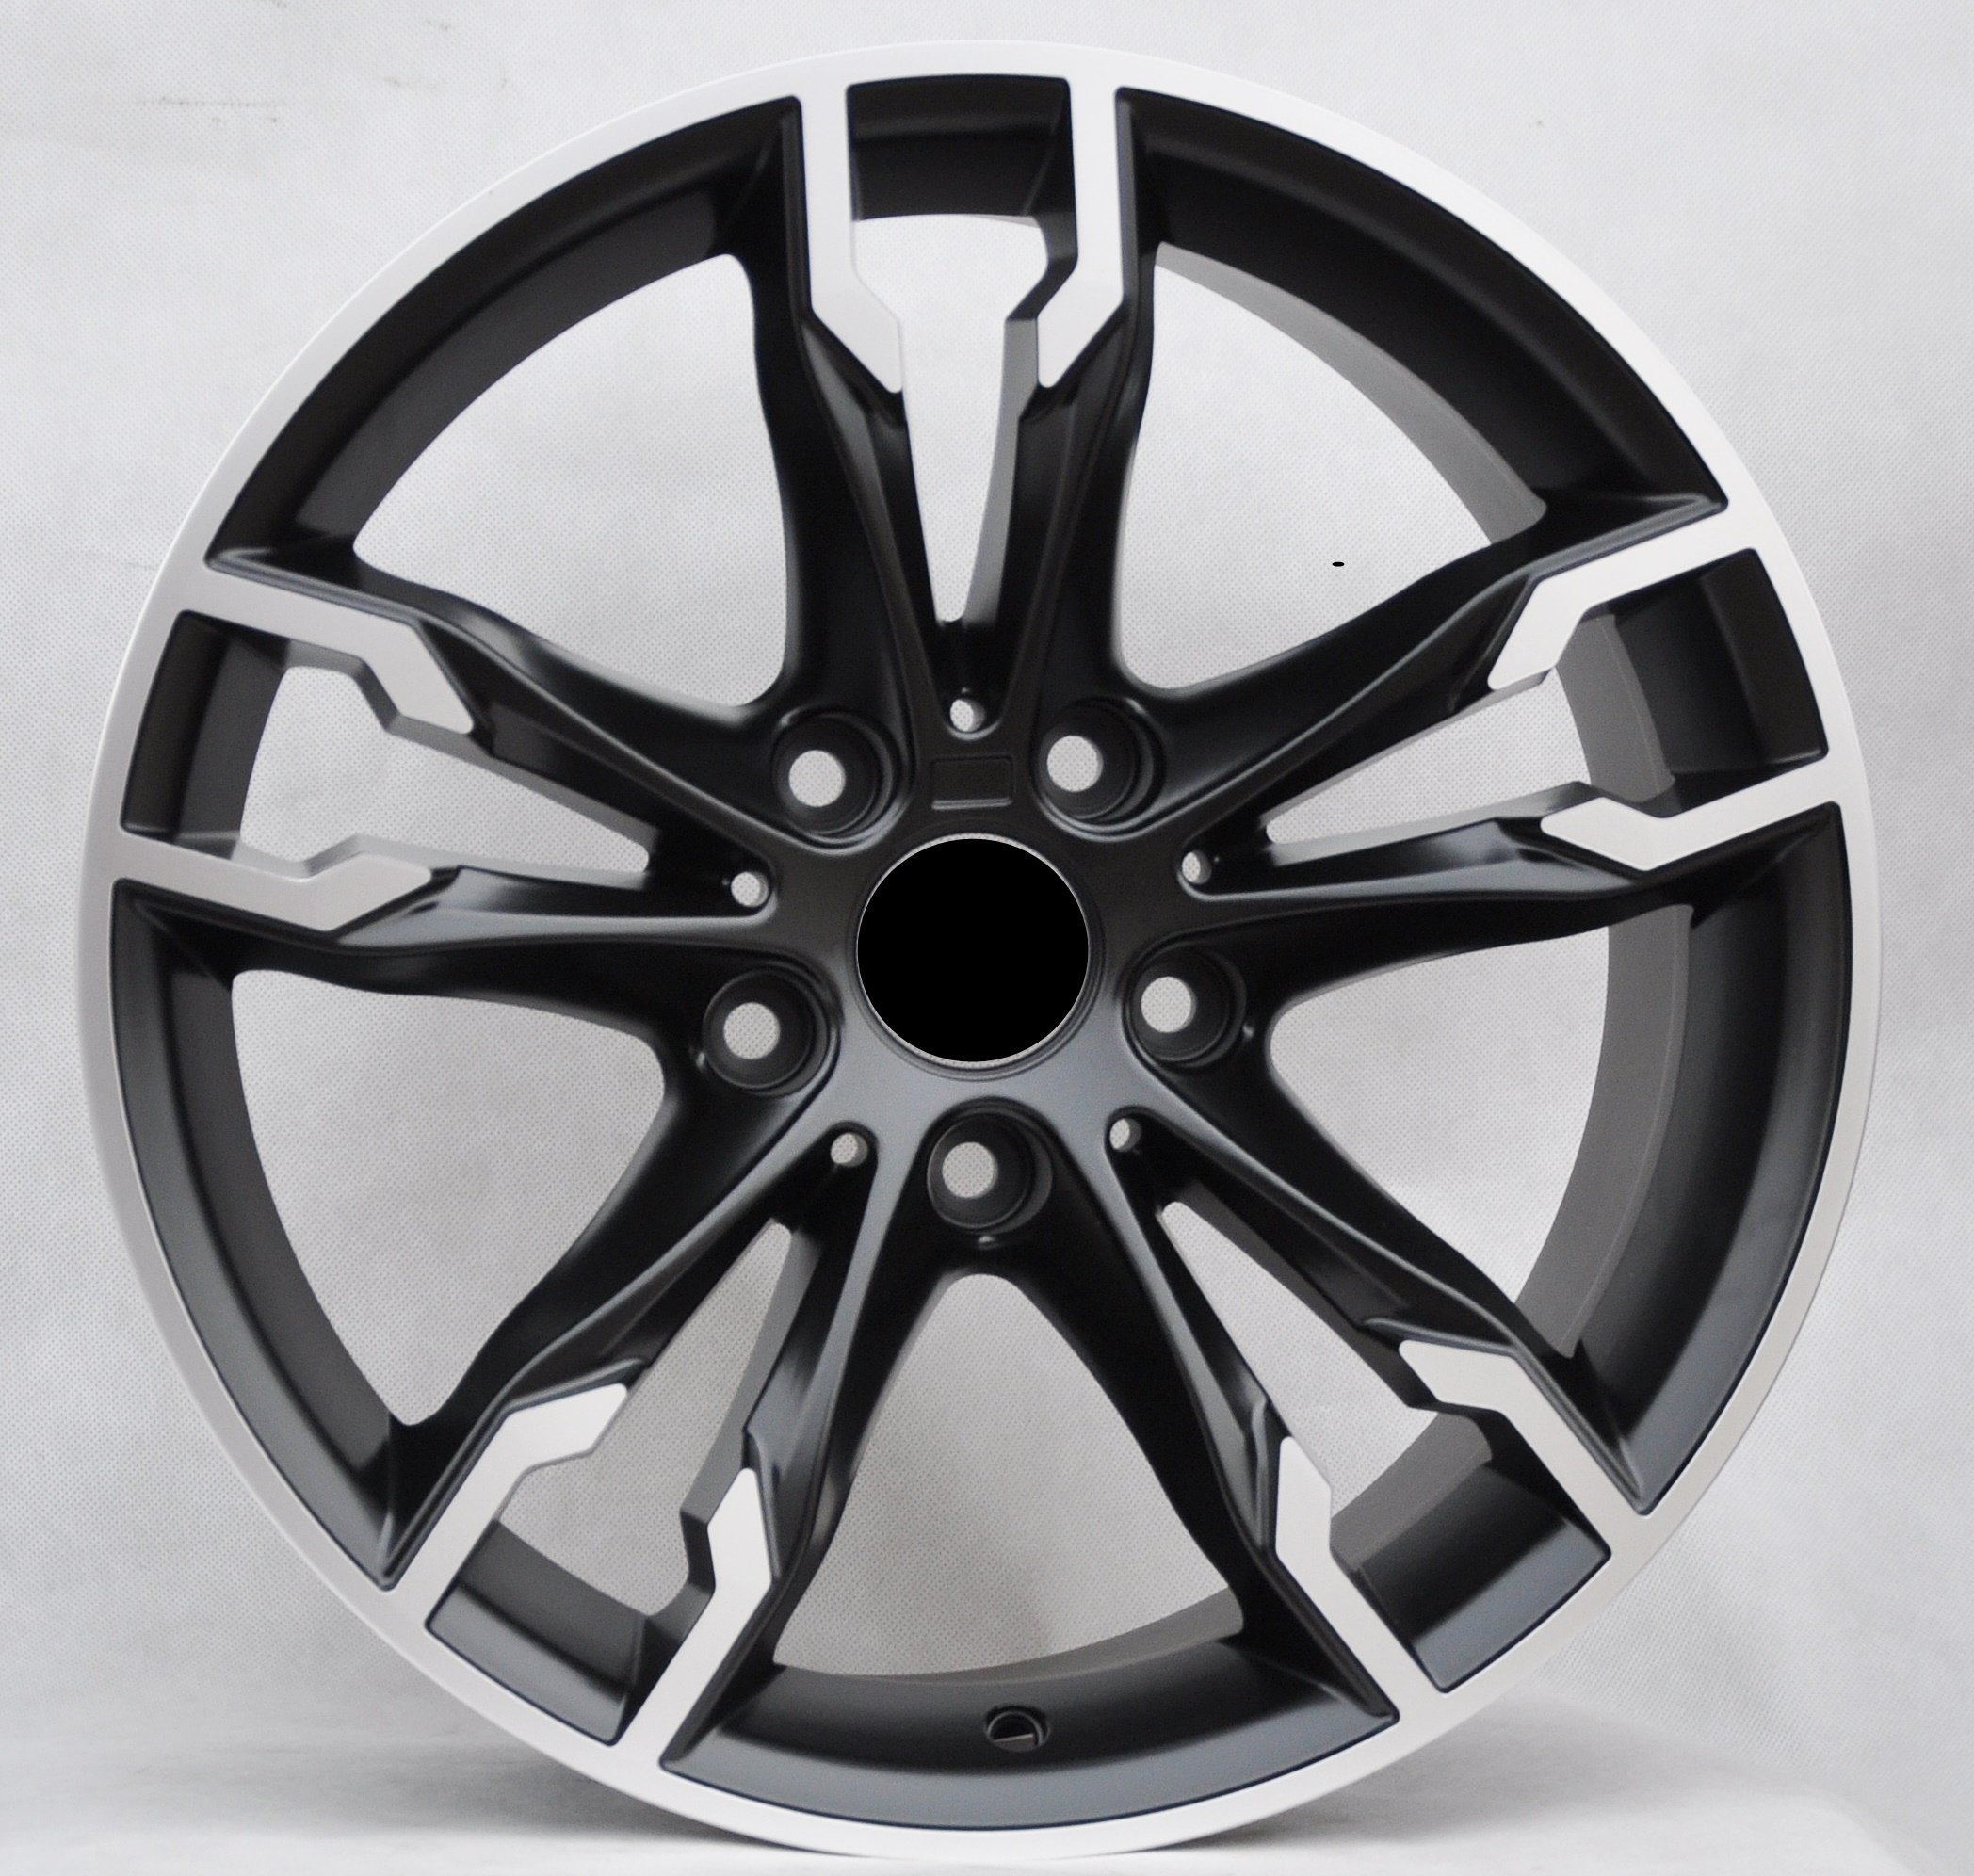 1257 MBM ALUFELNI 18 5x120 MEGFELELO BMW 5 7 F10 F11 F01 F30-2